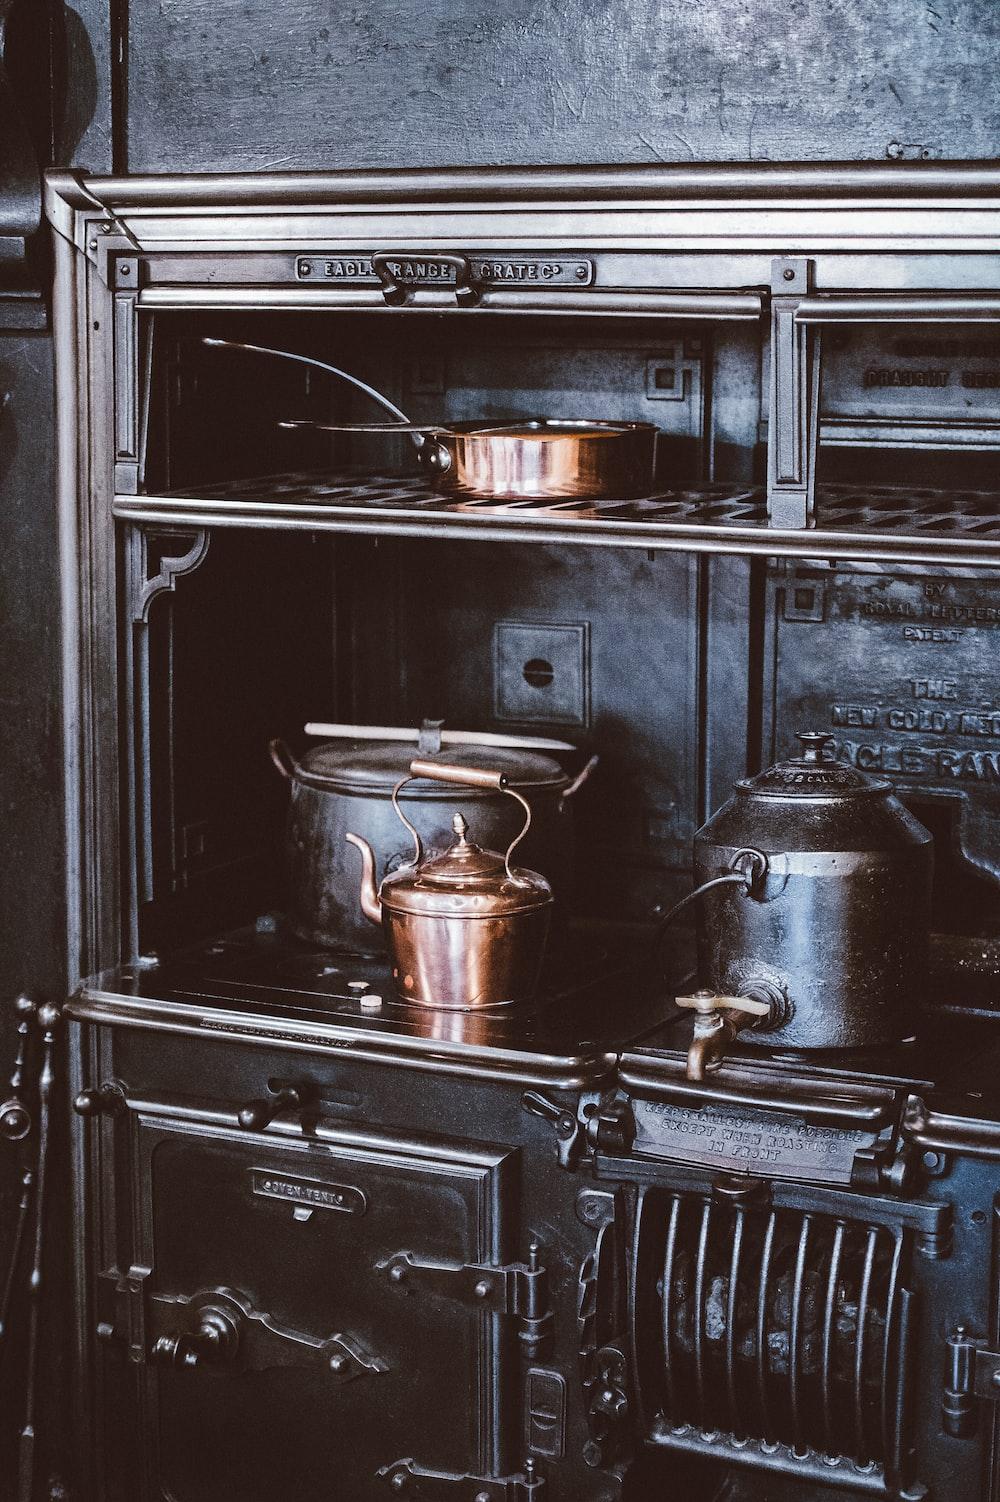 gray stainless steel teapot on range oven